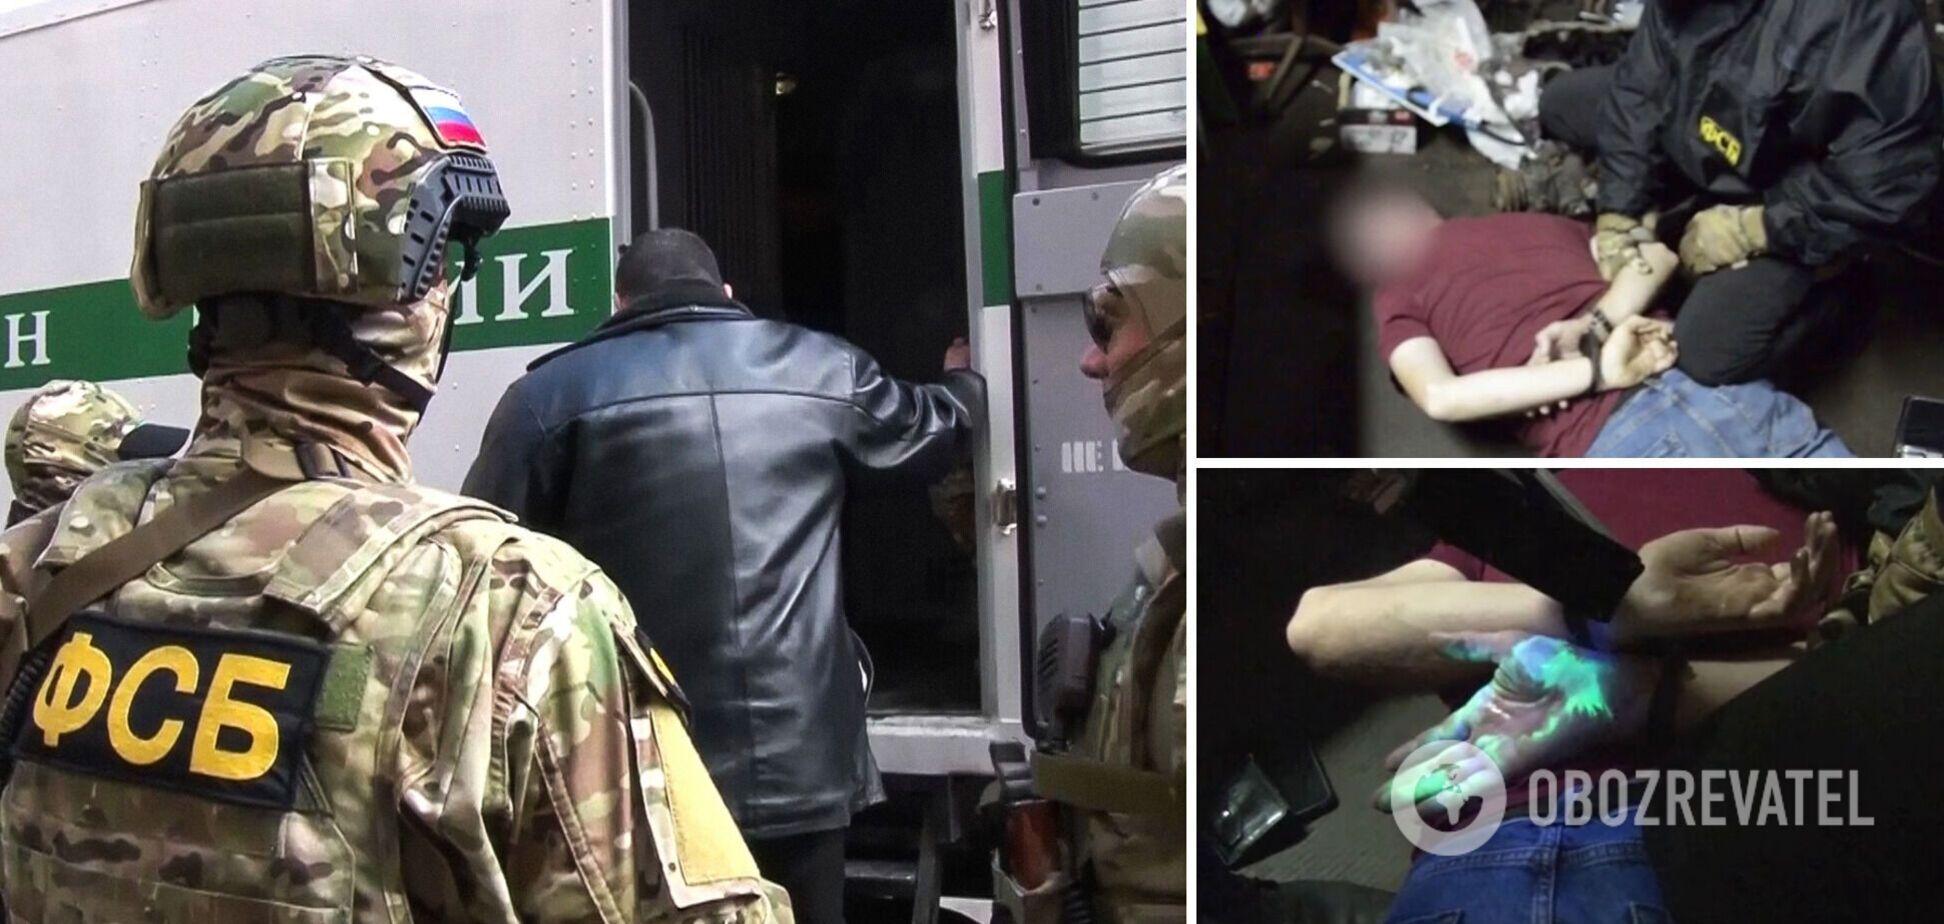 В Туле задержали украинца: обвиняют в шпионаже. Видео